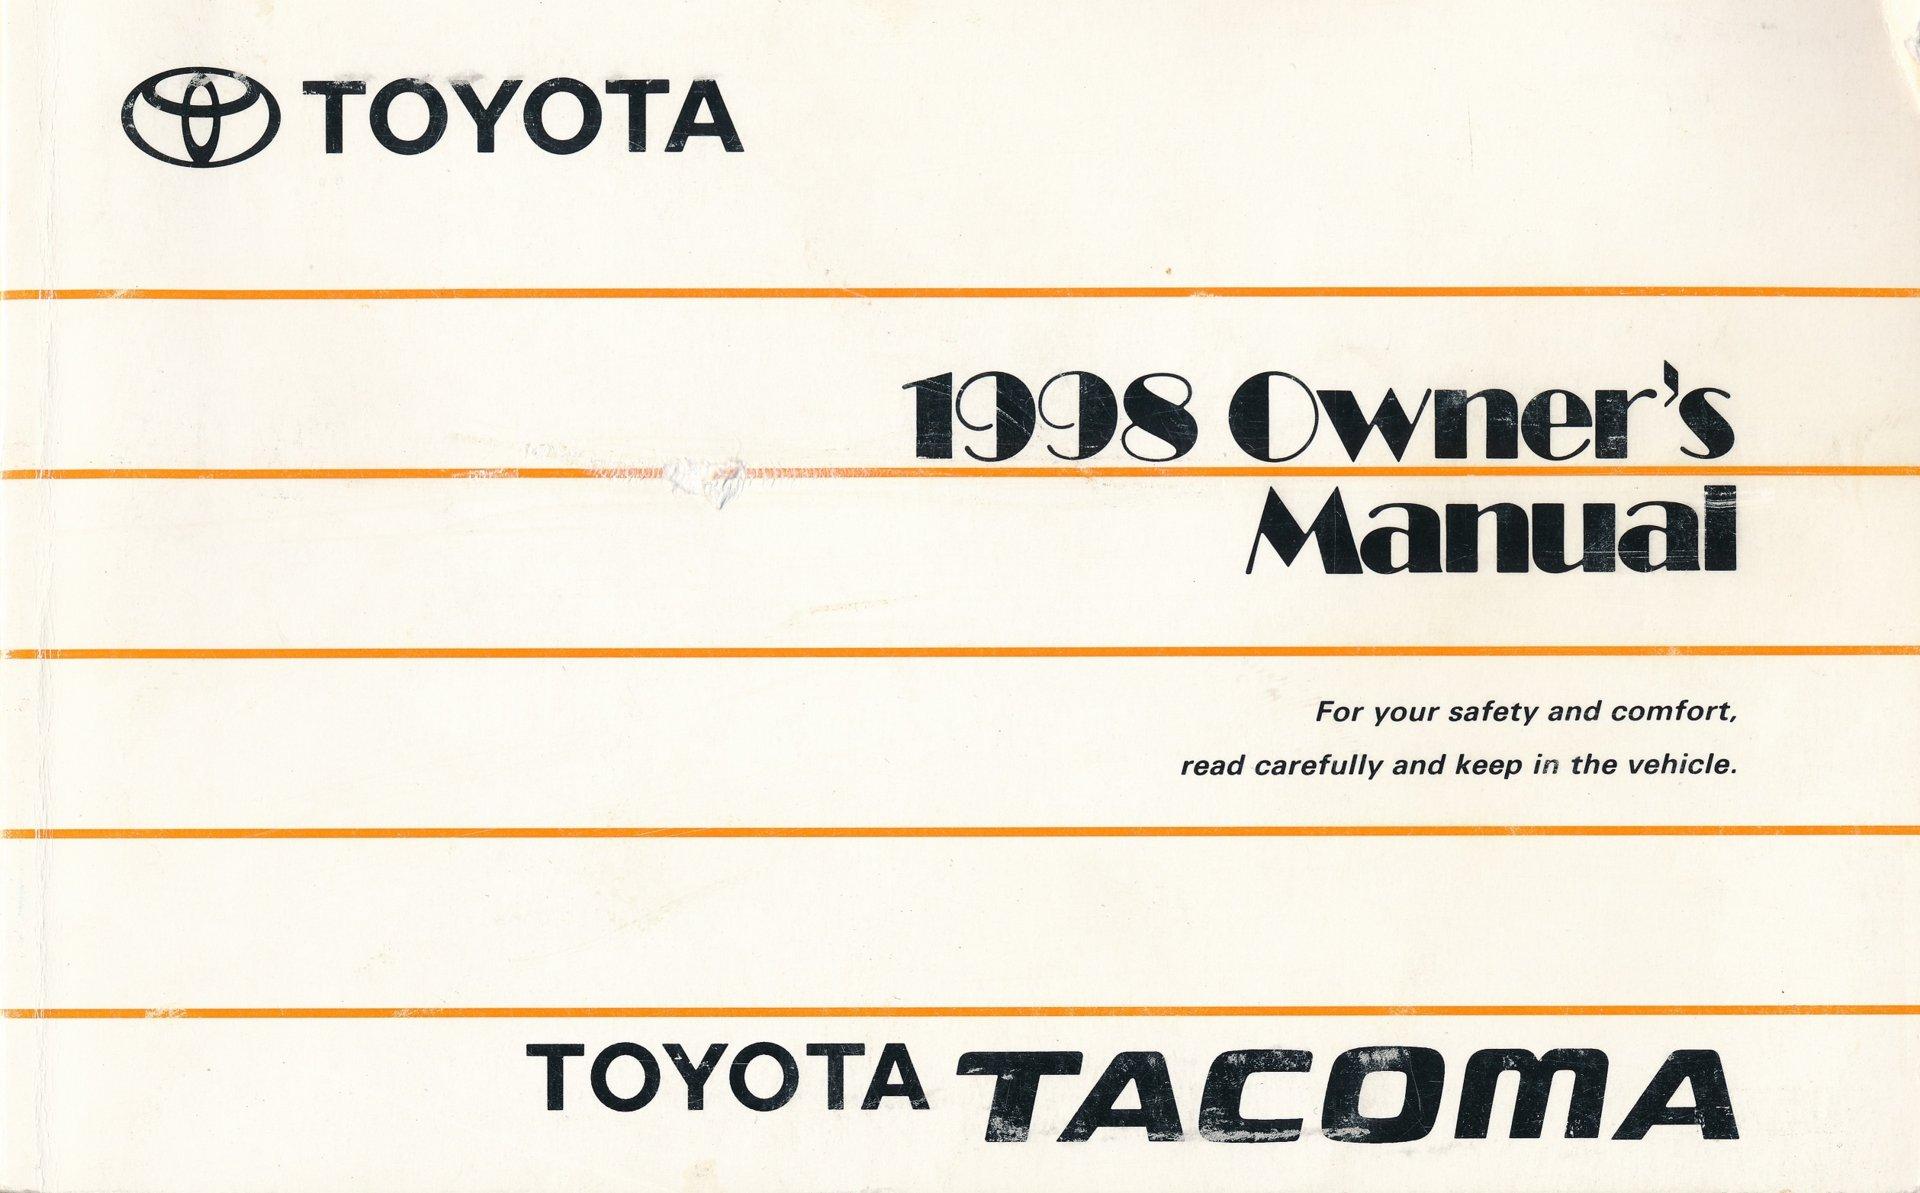 1998 Tacoma manual_sm.jpg